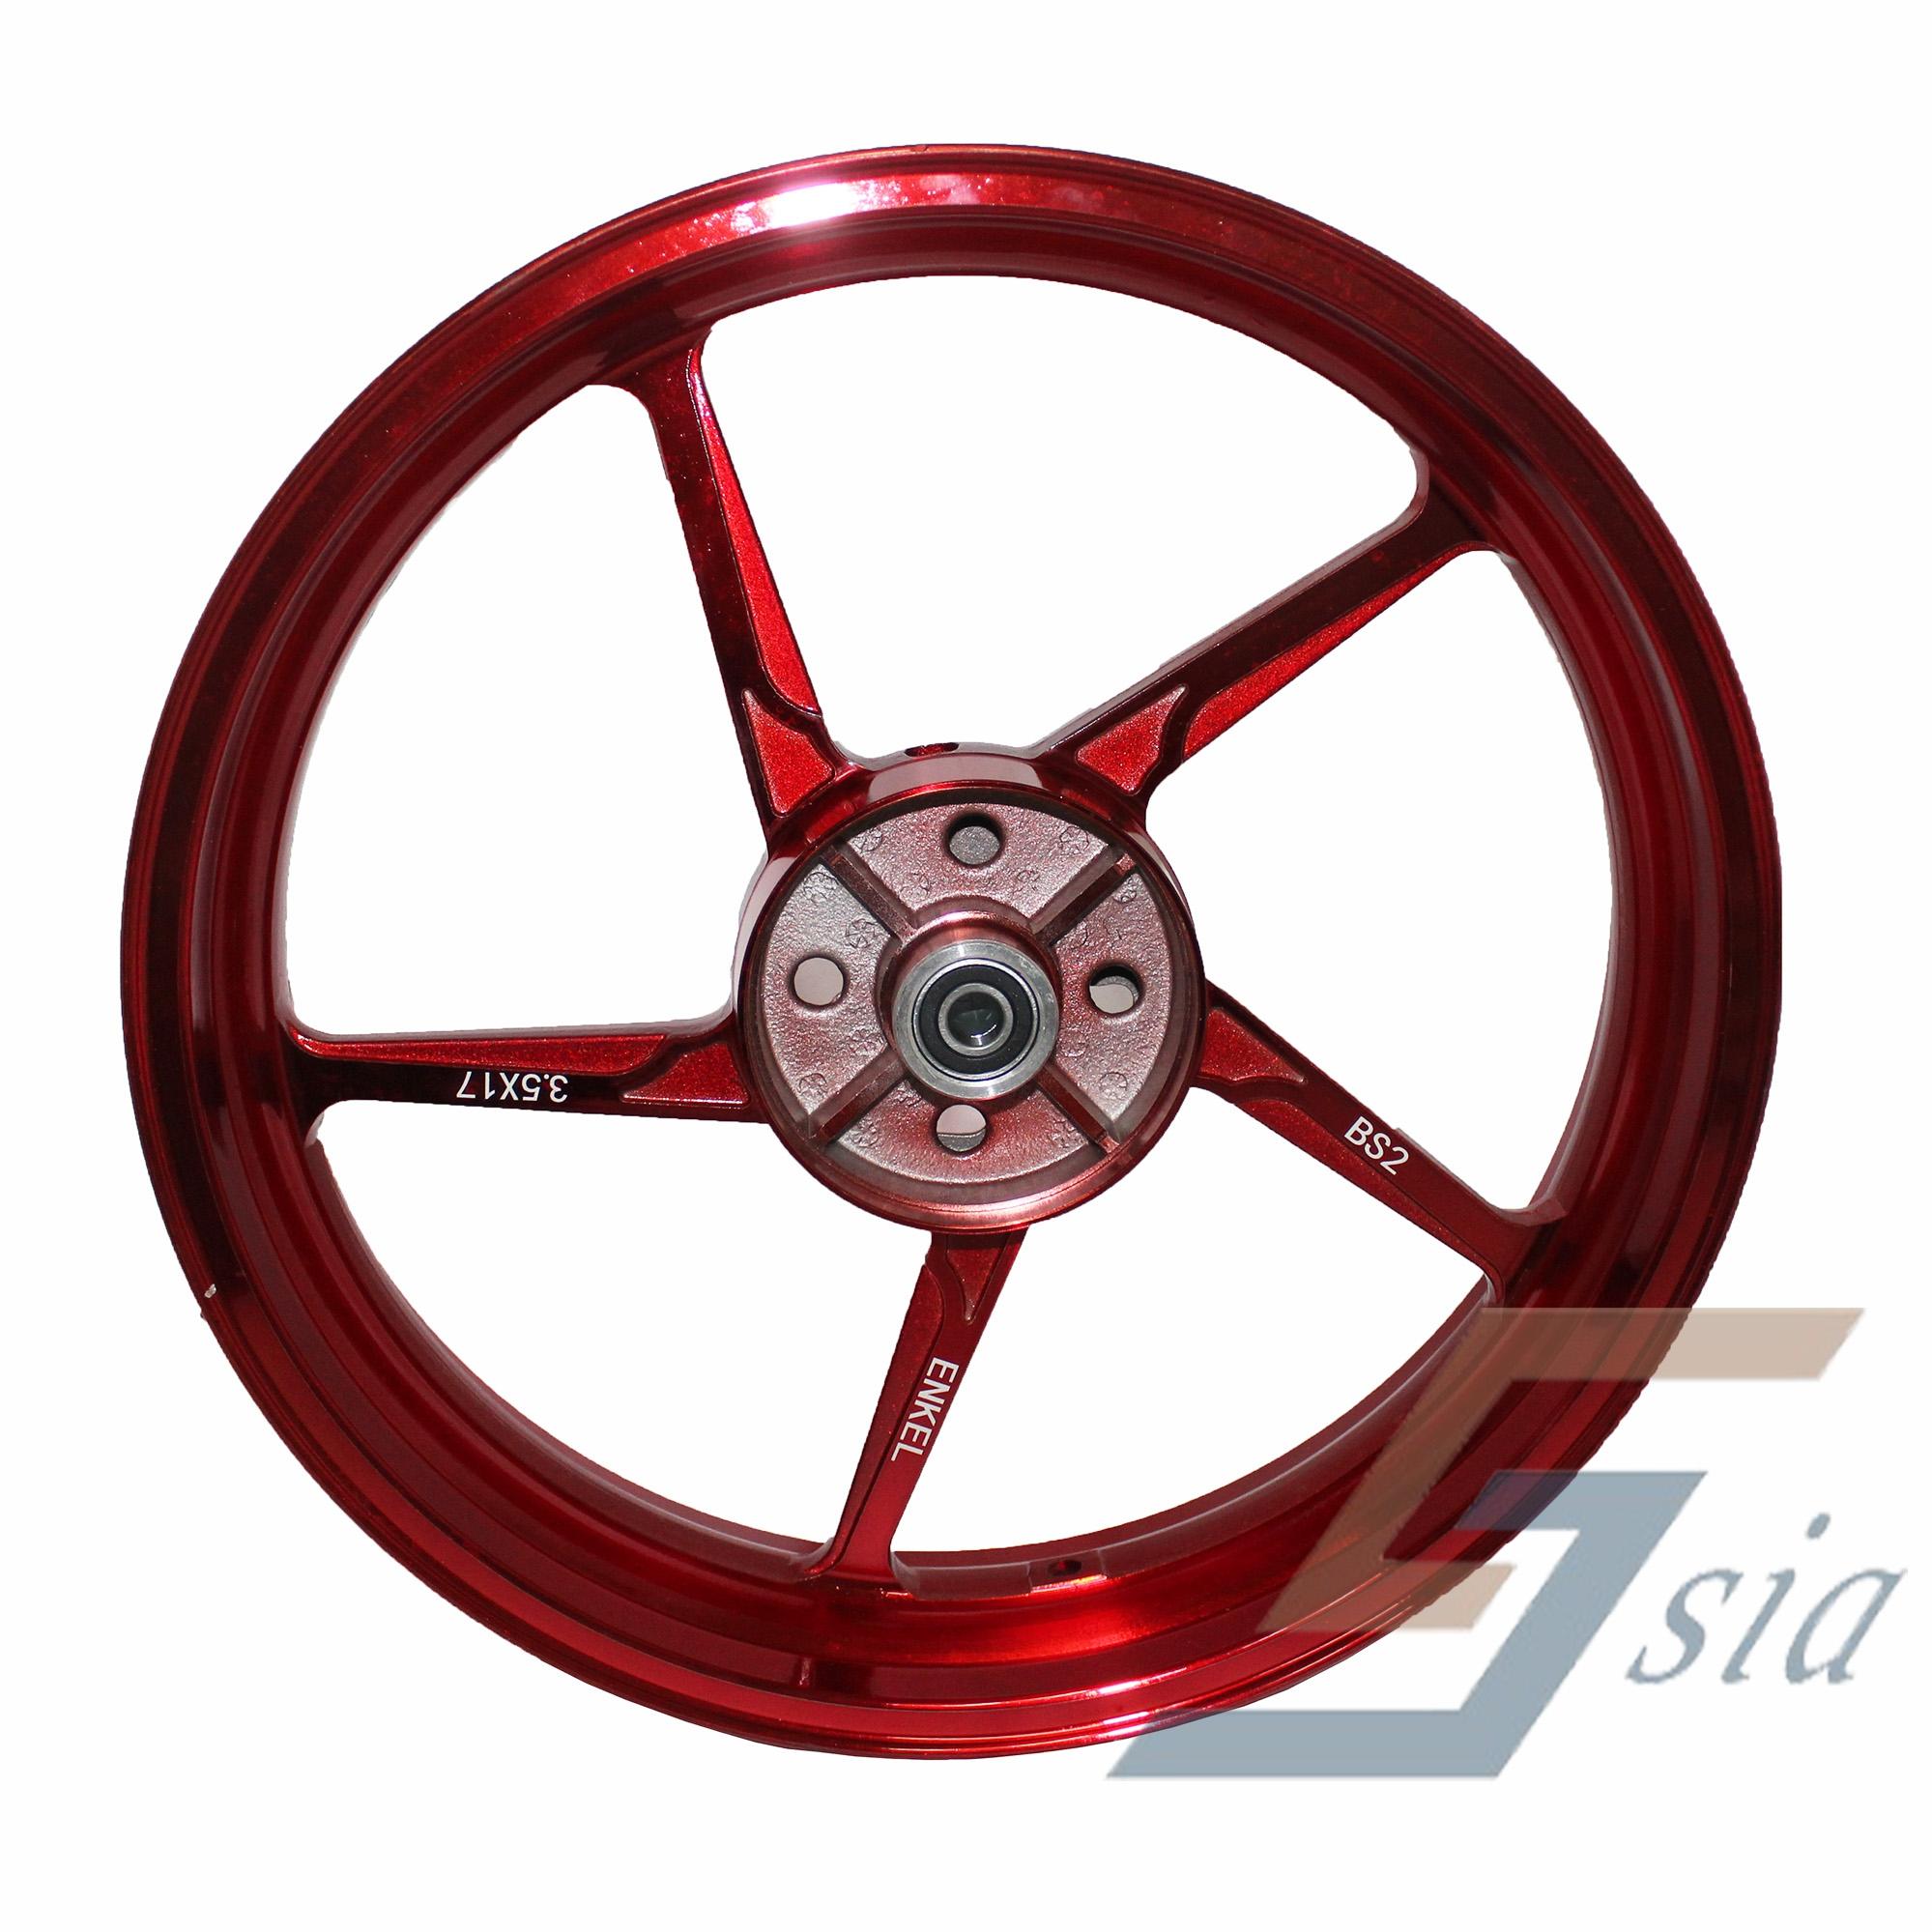 Yamaha Y15ZR BS2 5L Racing Sport Rims (Red)